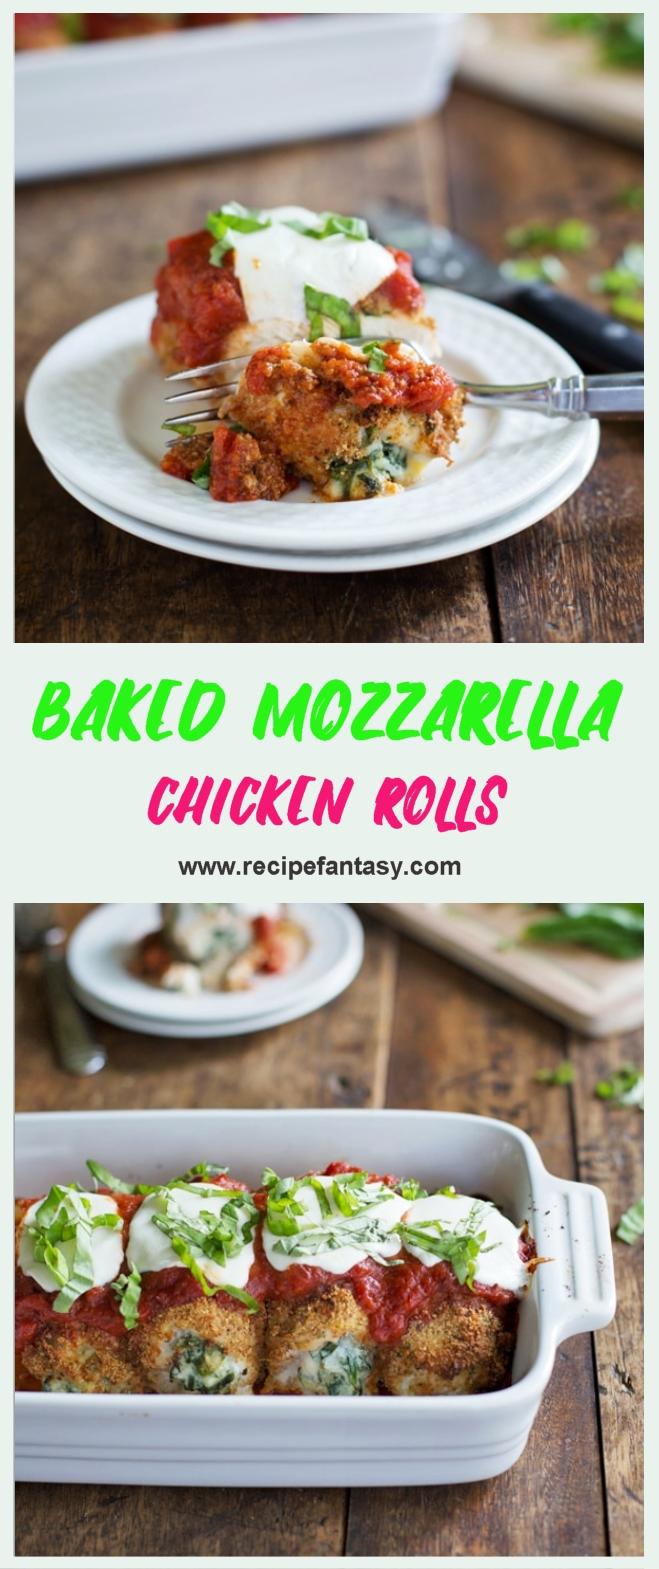 Baked Mozzarella Chicken Rolls